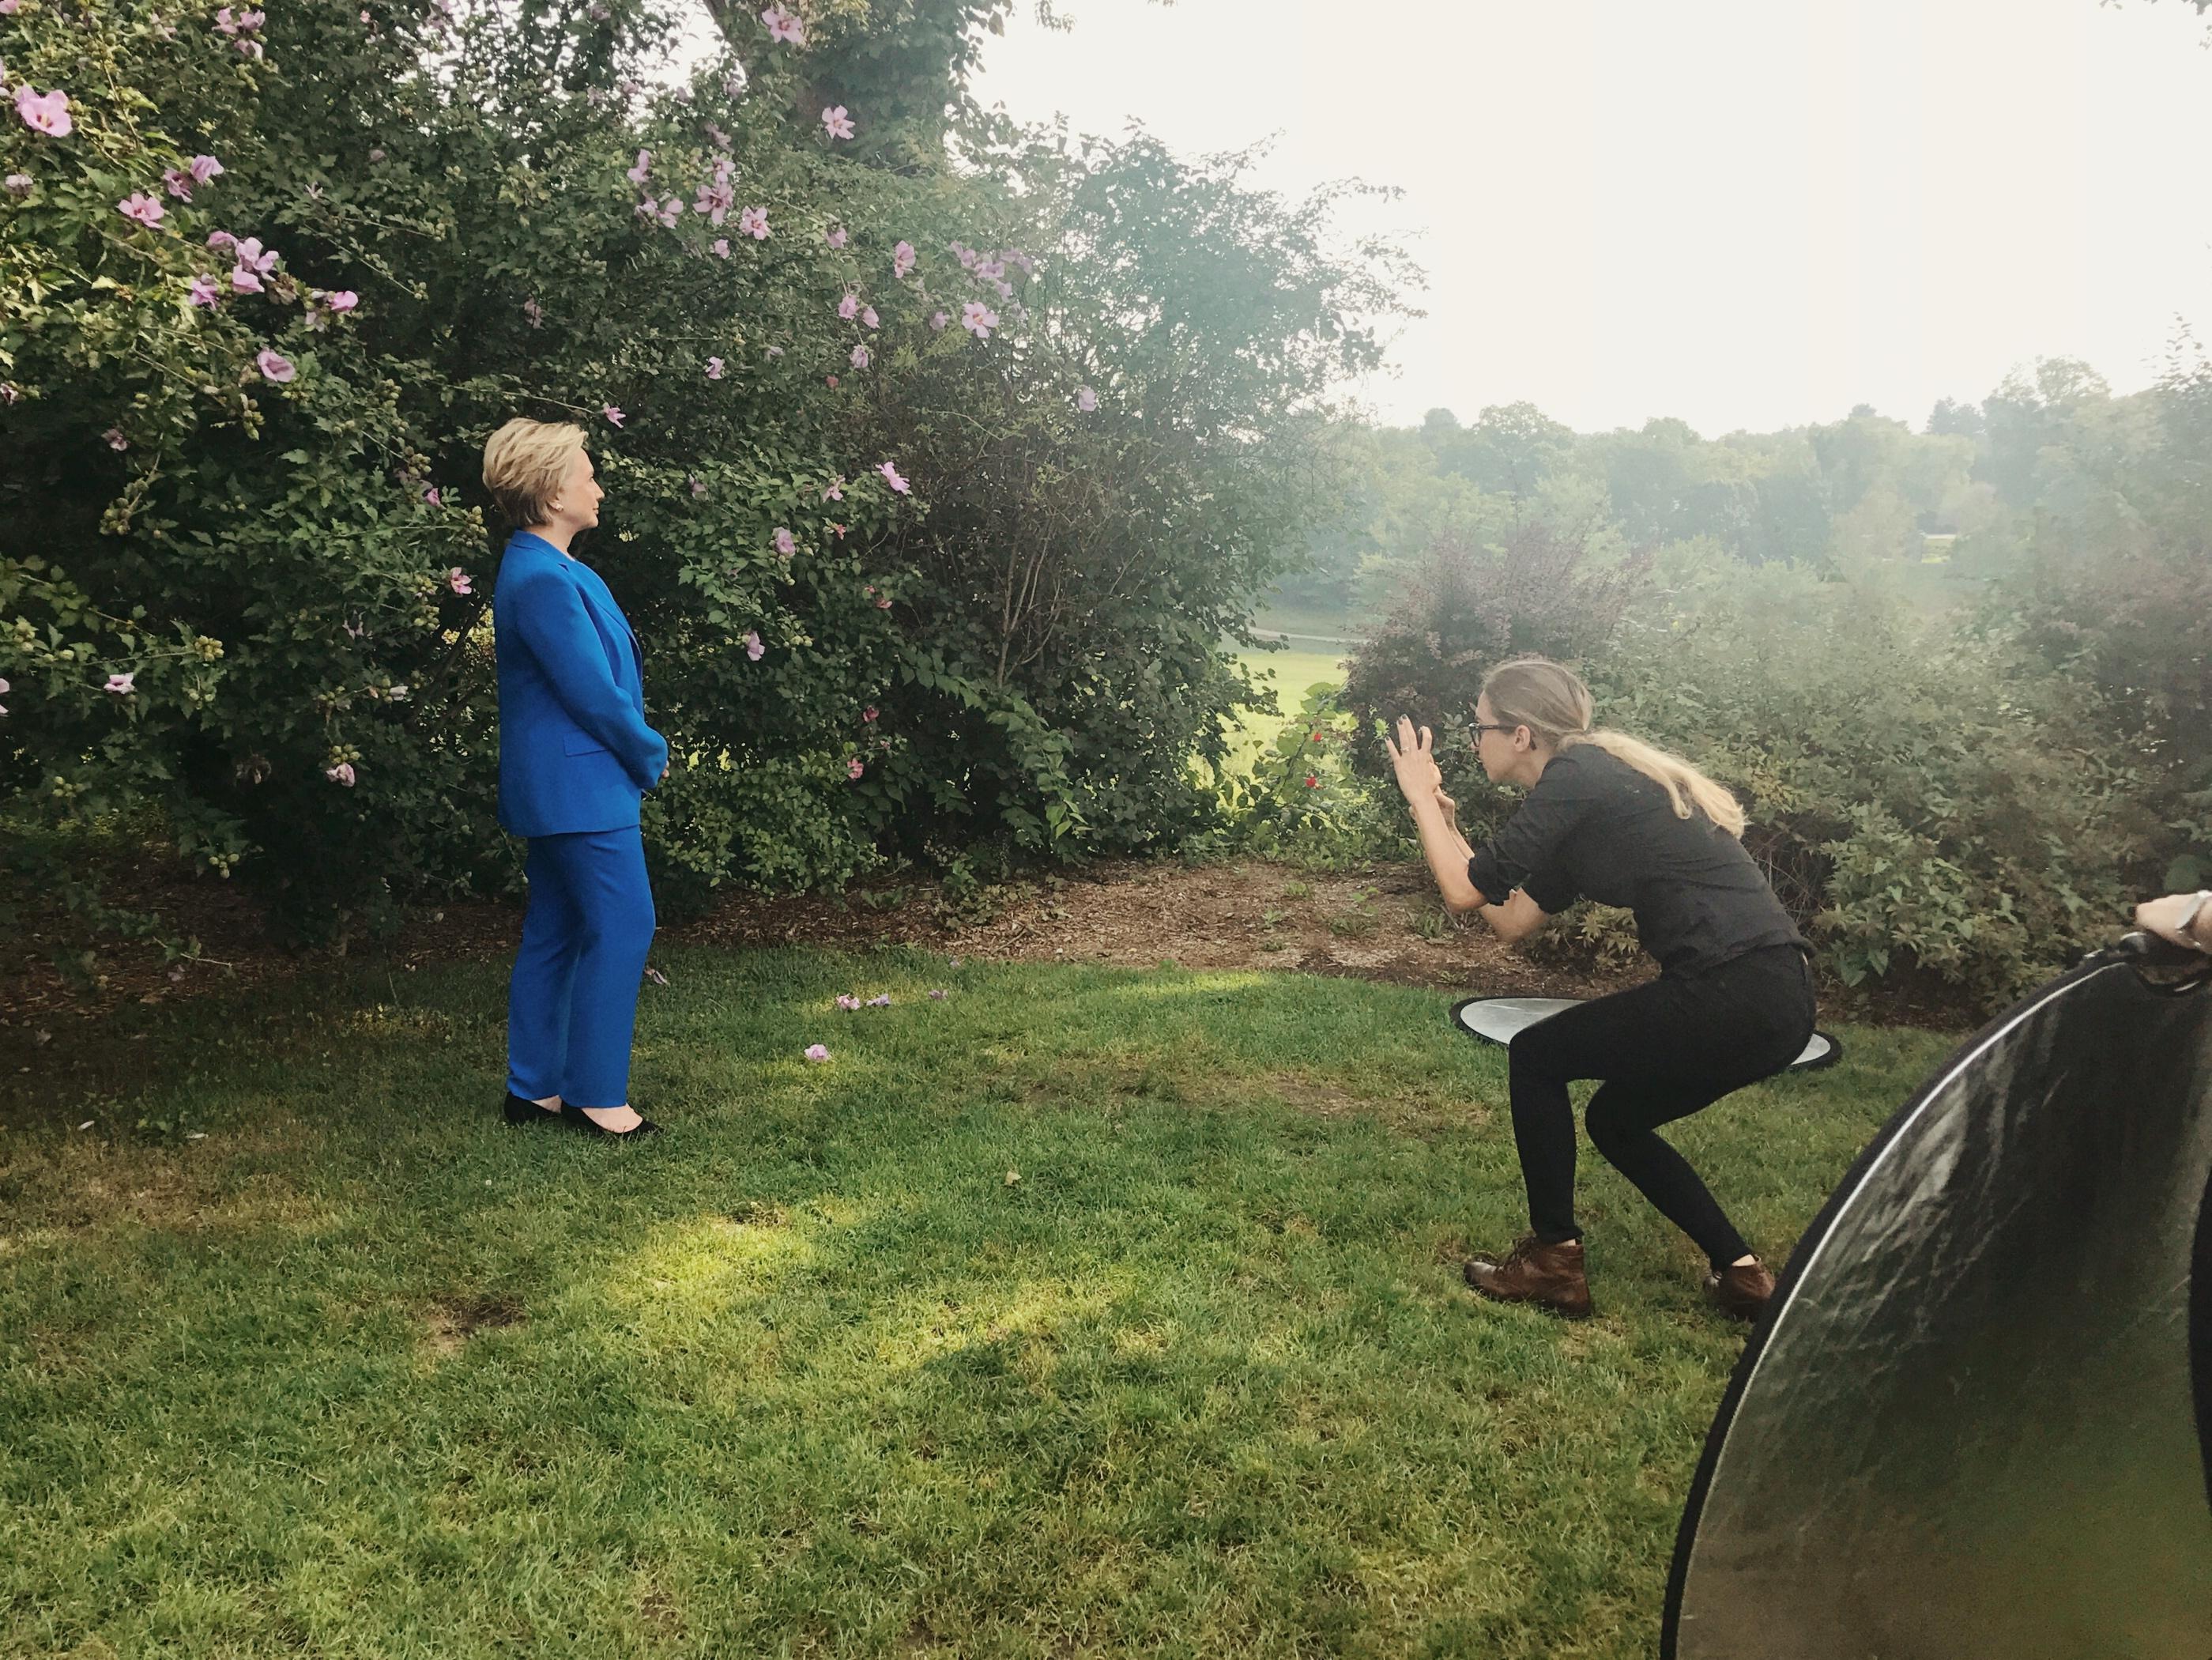 Photographer Luisa Dörr photographs secretary Hillary Rodham Clinton, in Chappaqua, New York on Sept. 5, 2017.